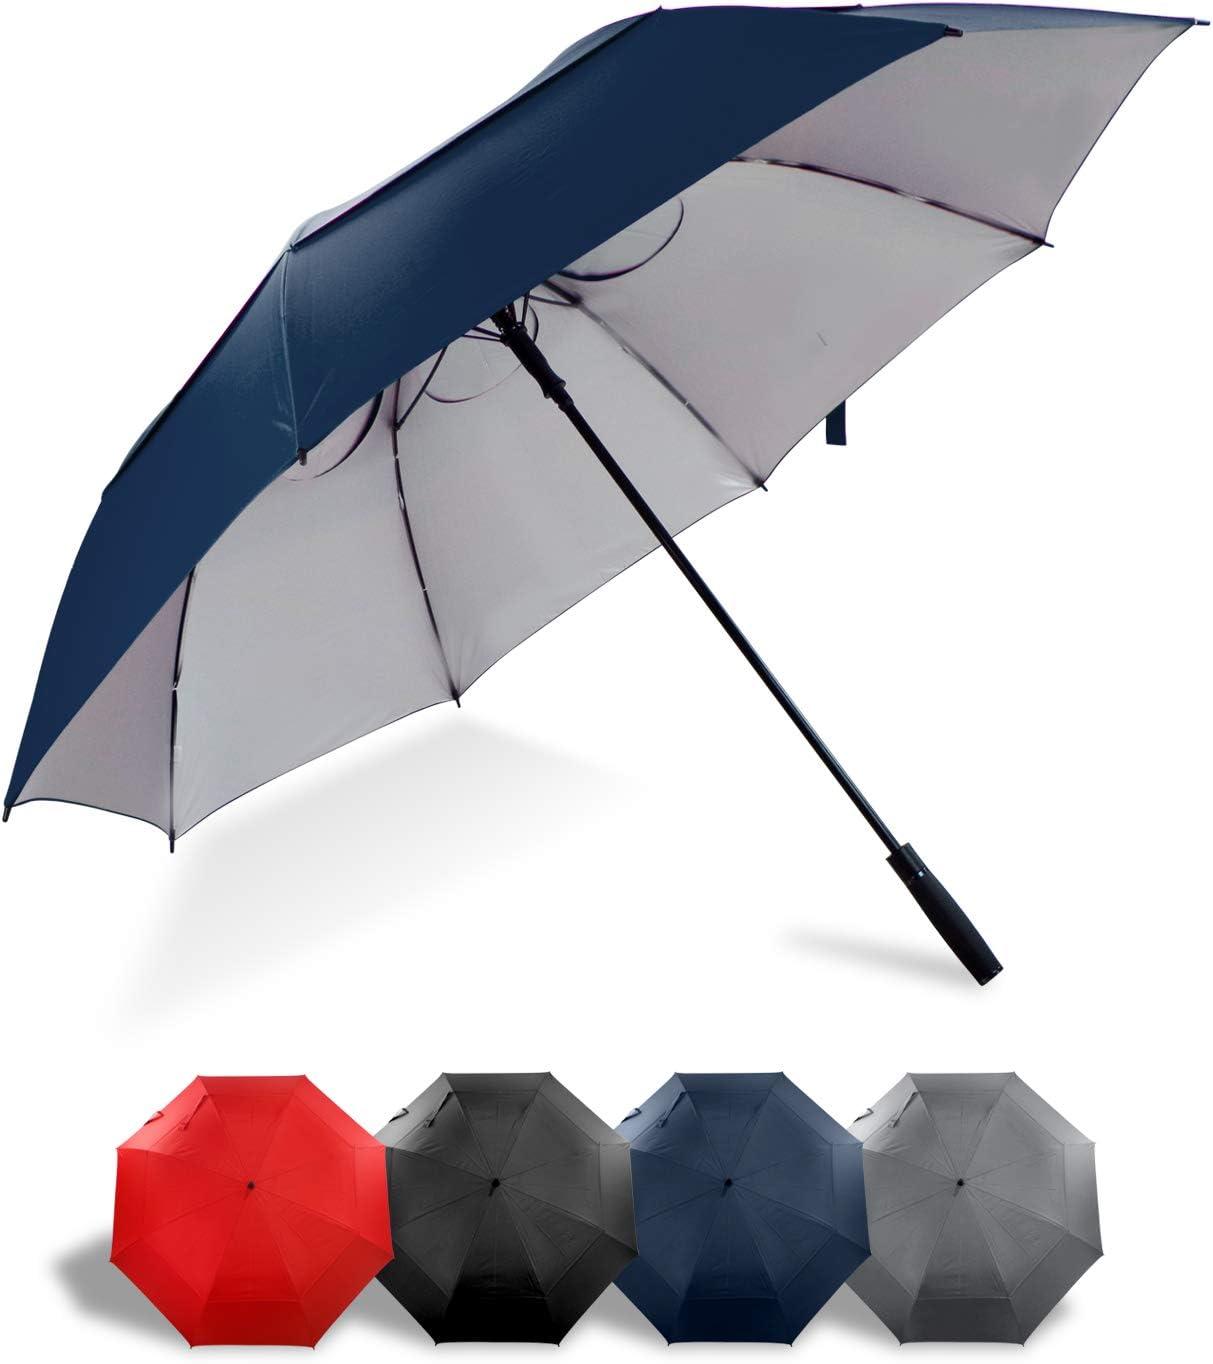 Denver Mall Lejorain 68 inch Large Windproof Oversi Auto Finally popular brand Golf Open Umbrella-